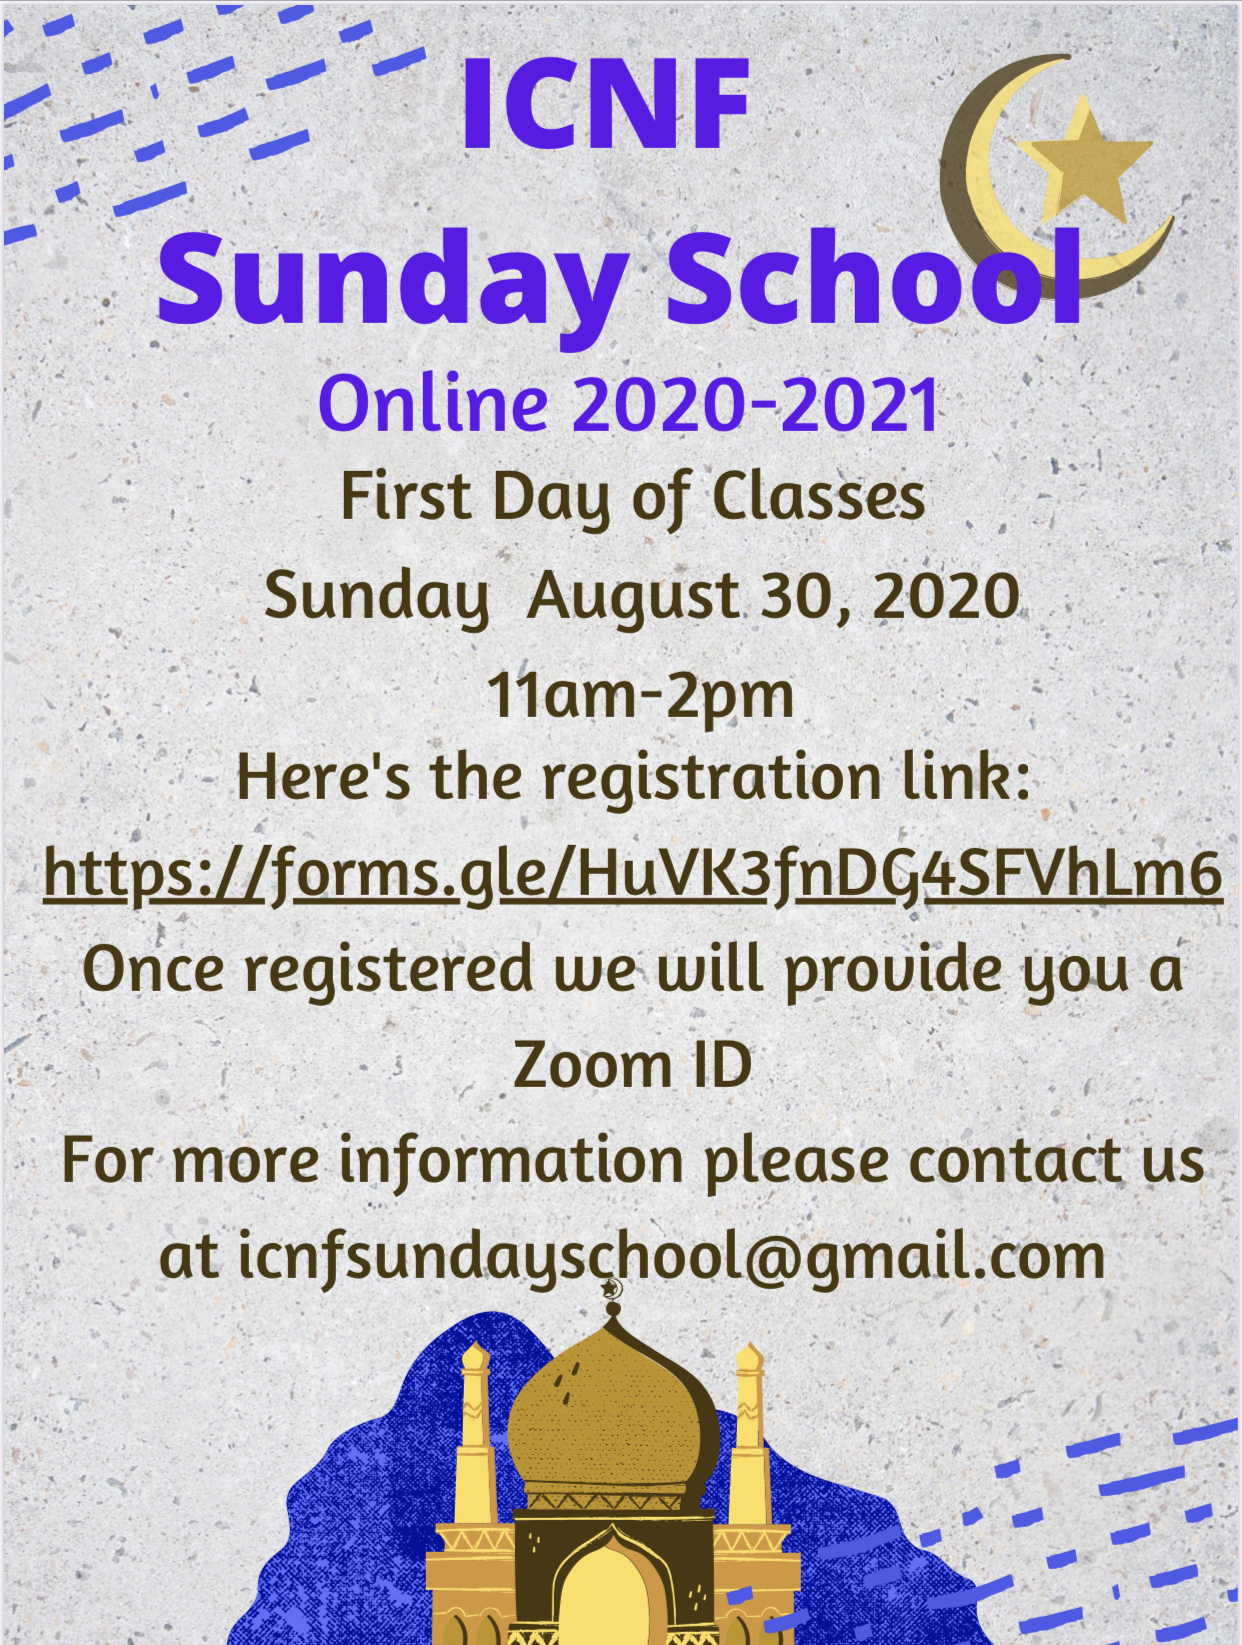 Click here Online Registration Link https://forms.gle/HuVK3fnDG4SFVhLm6